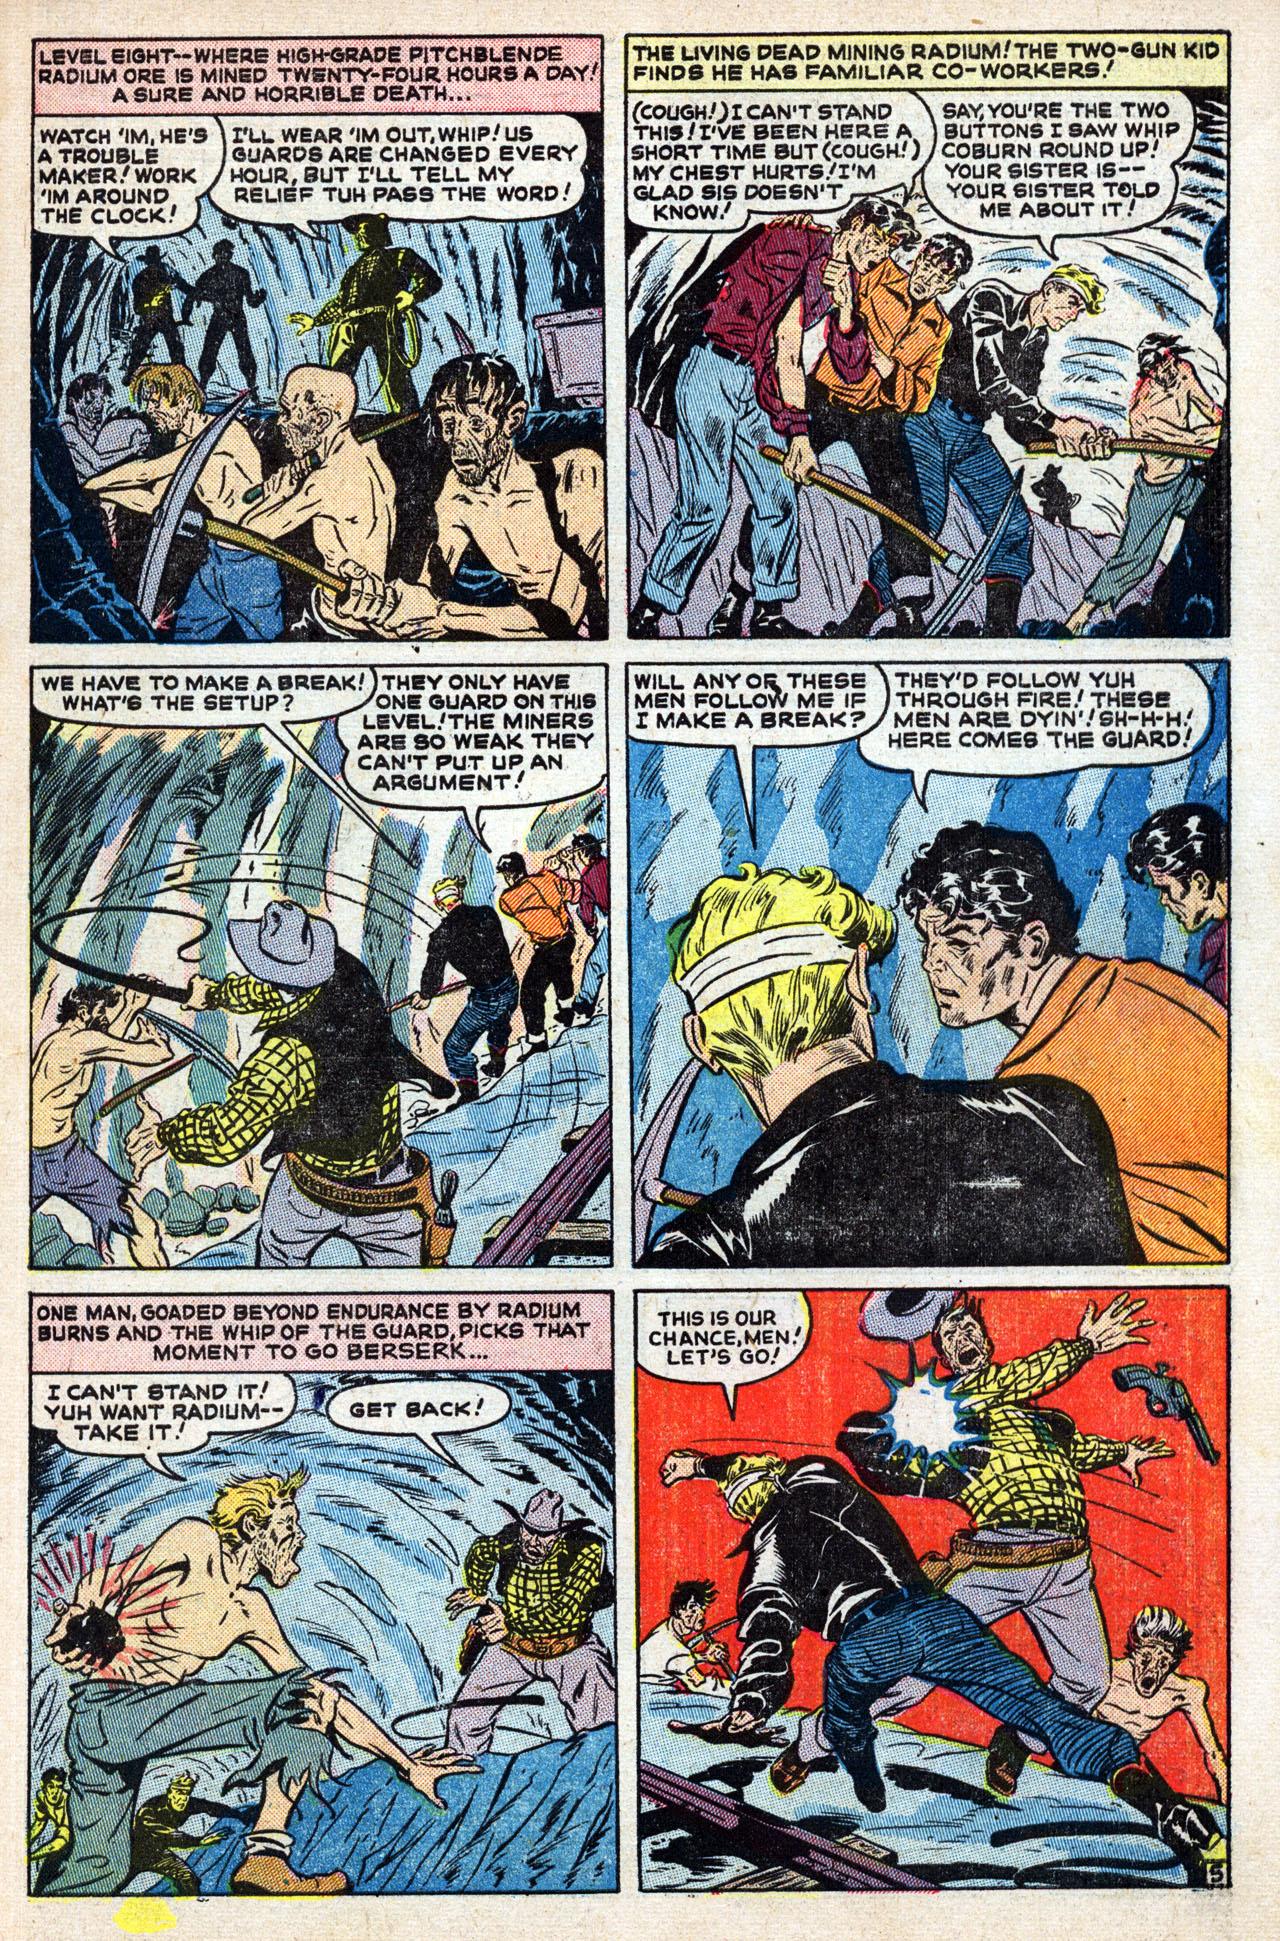 Read online Two-Gun Kid comic -  Issue #8 - 7